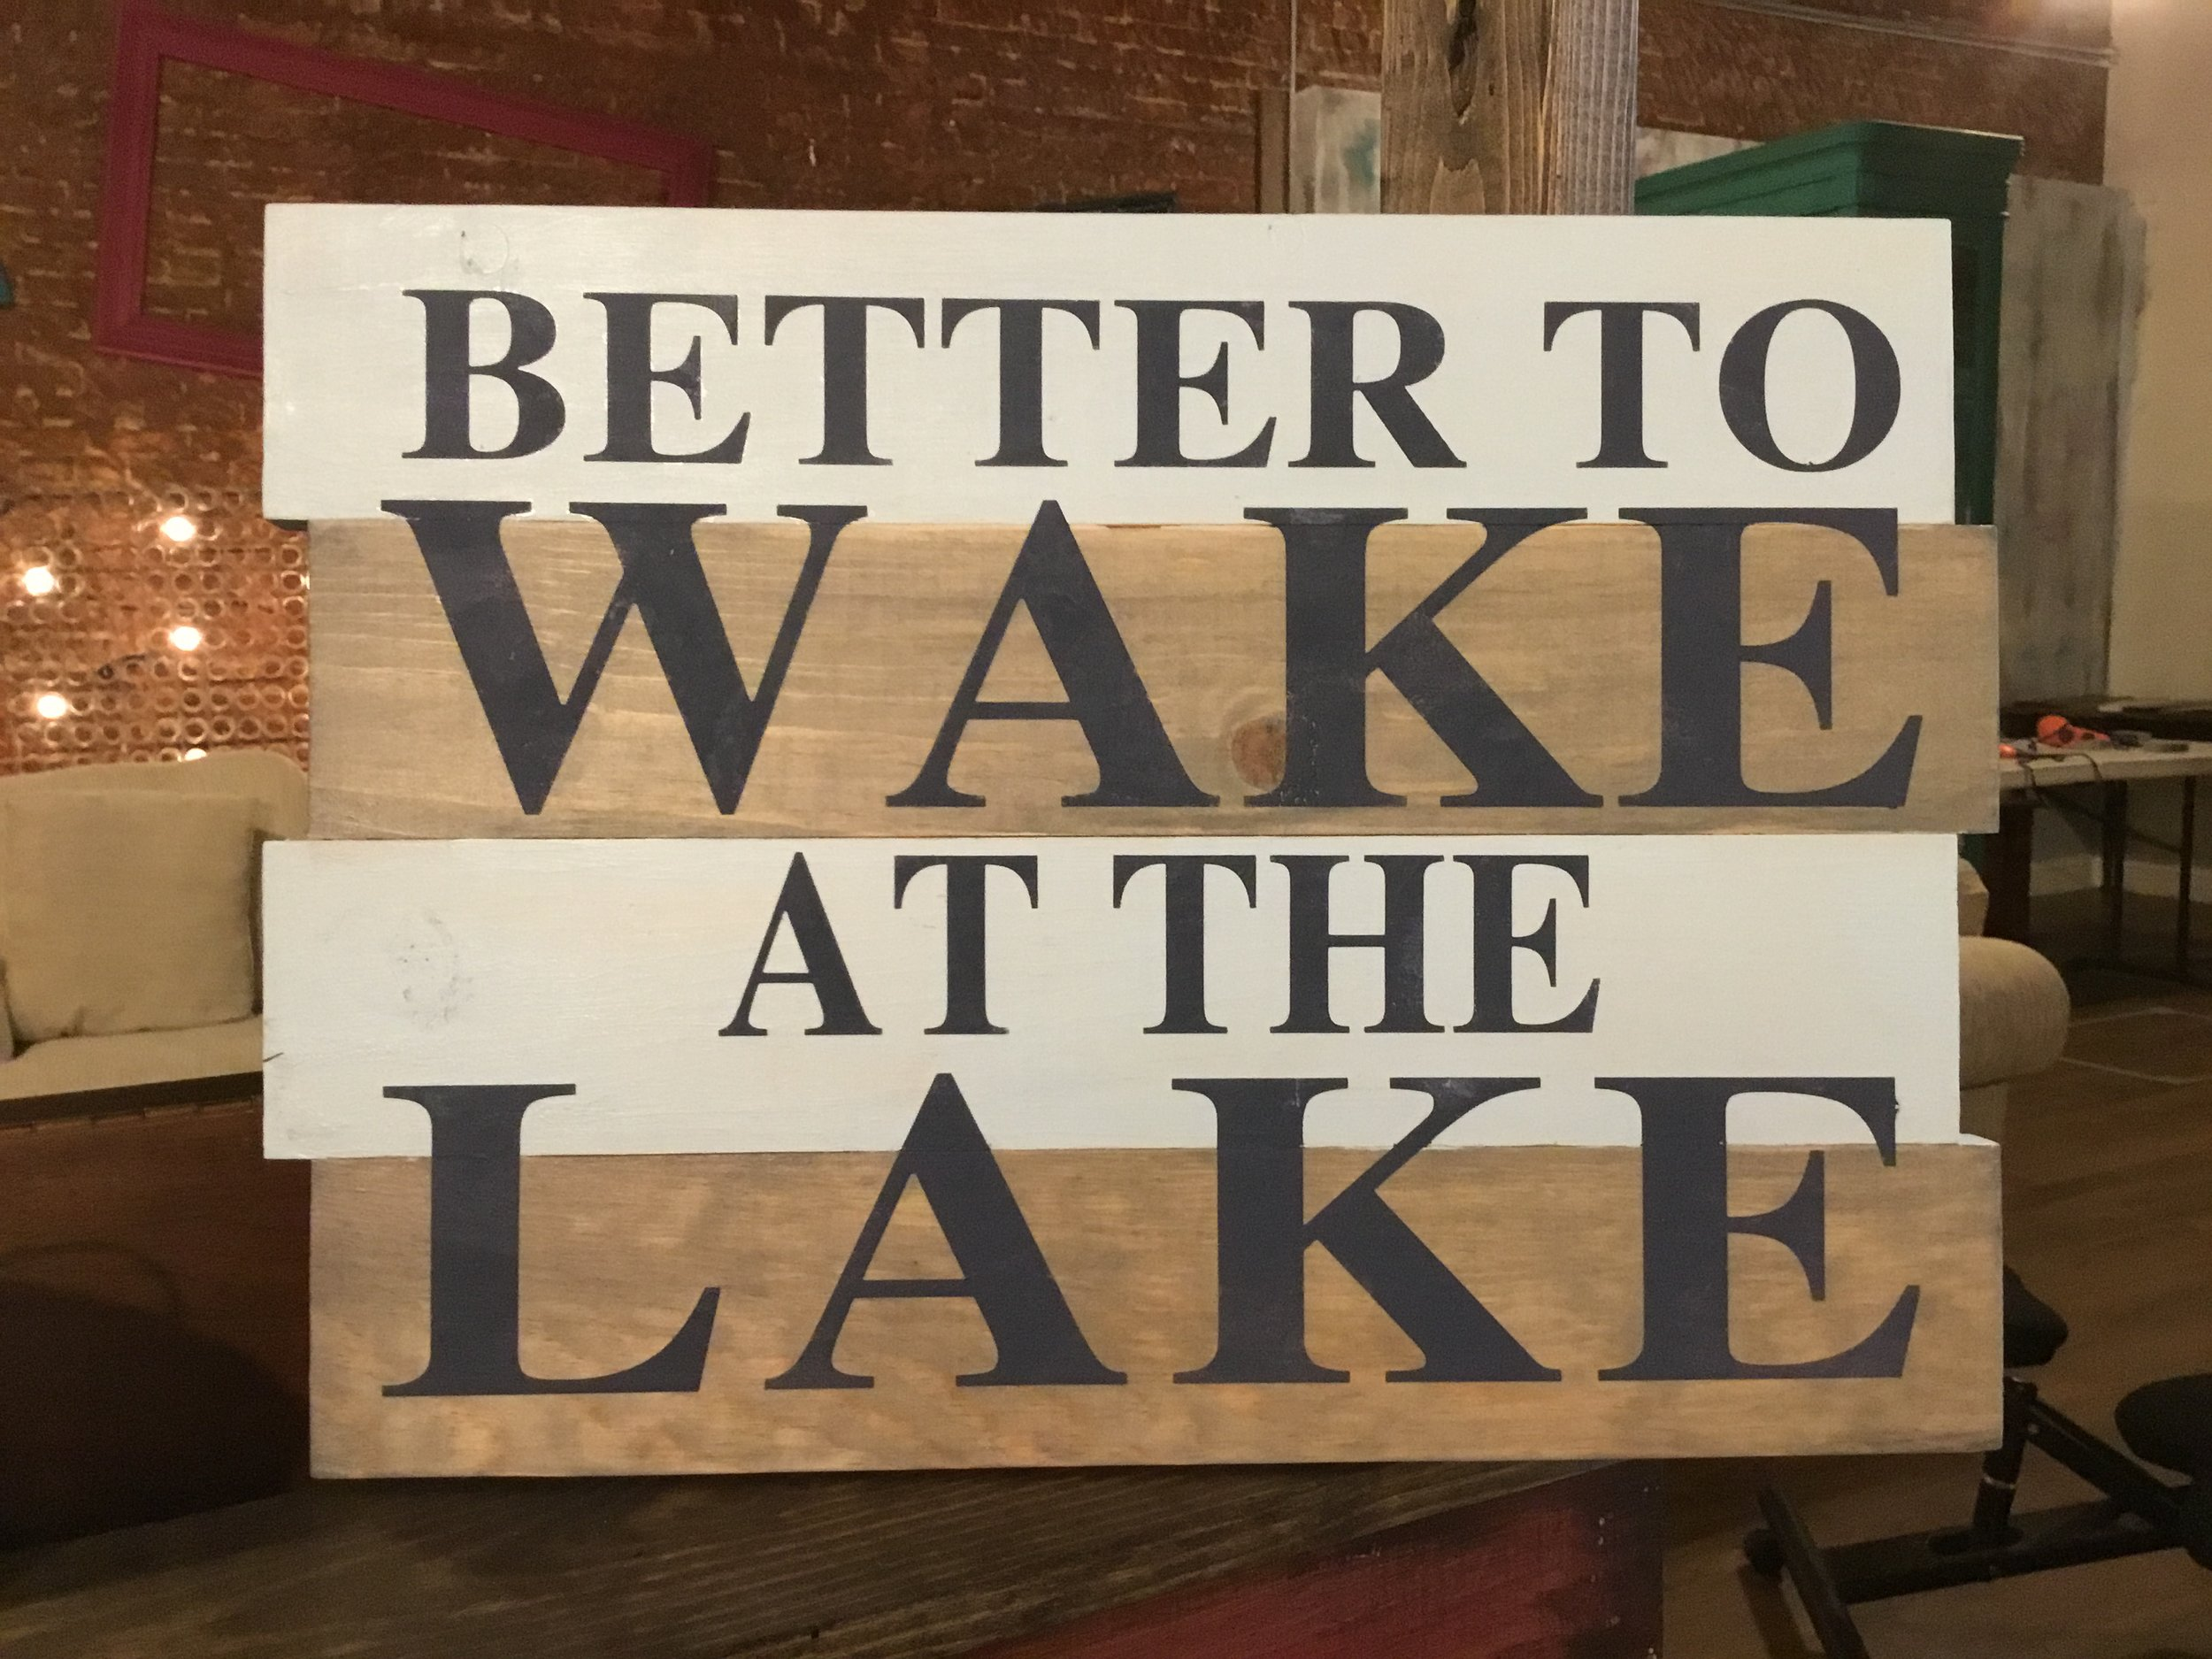 Better to wake at the Lake